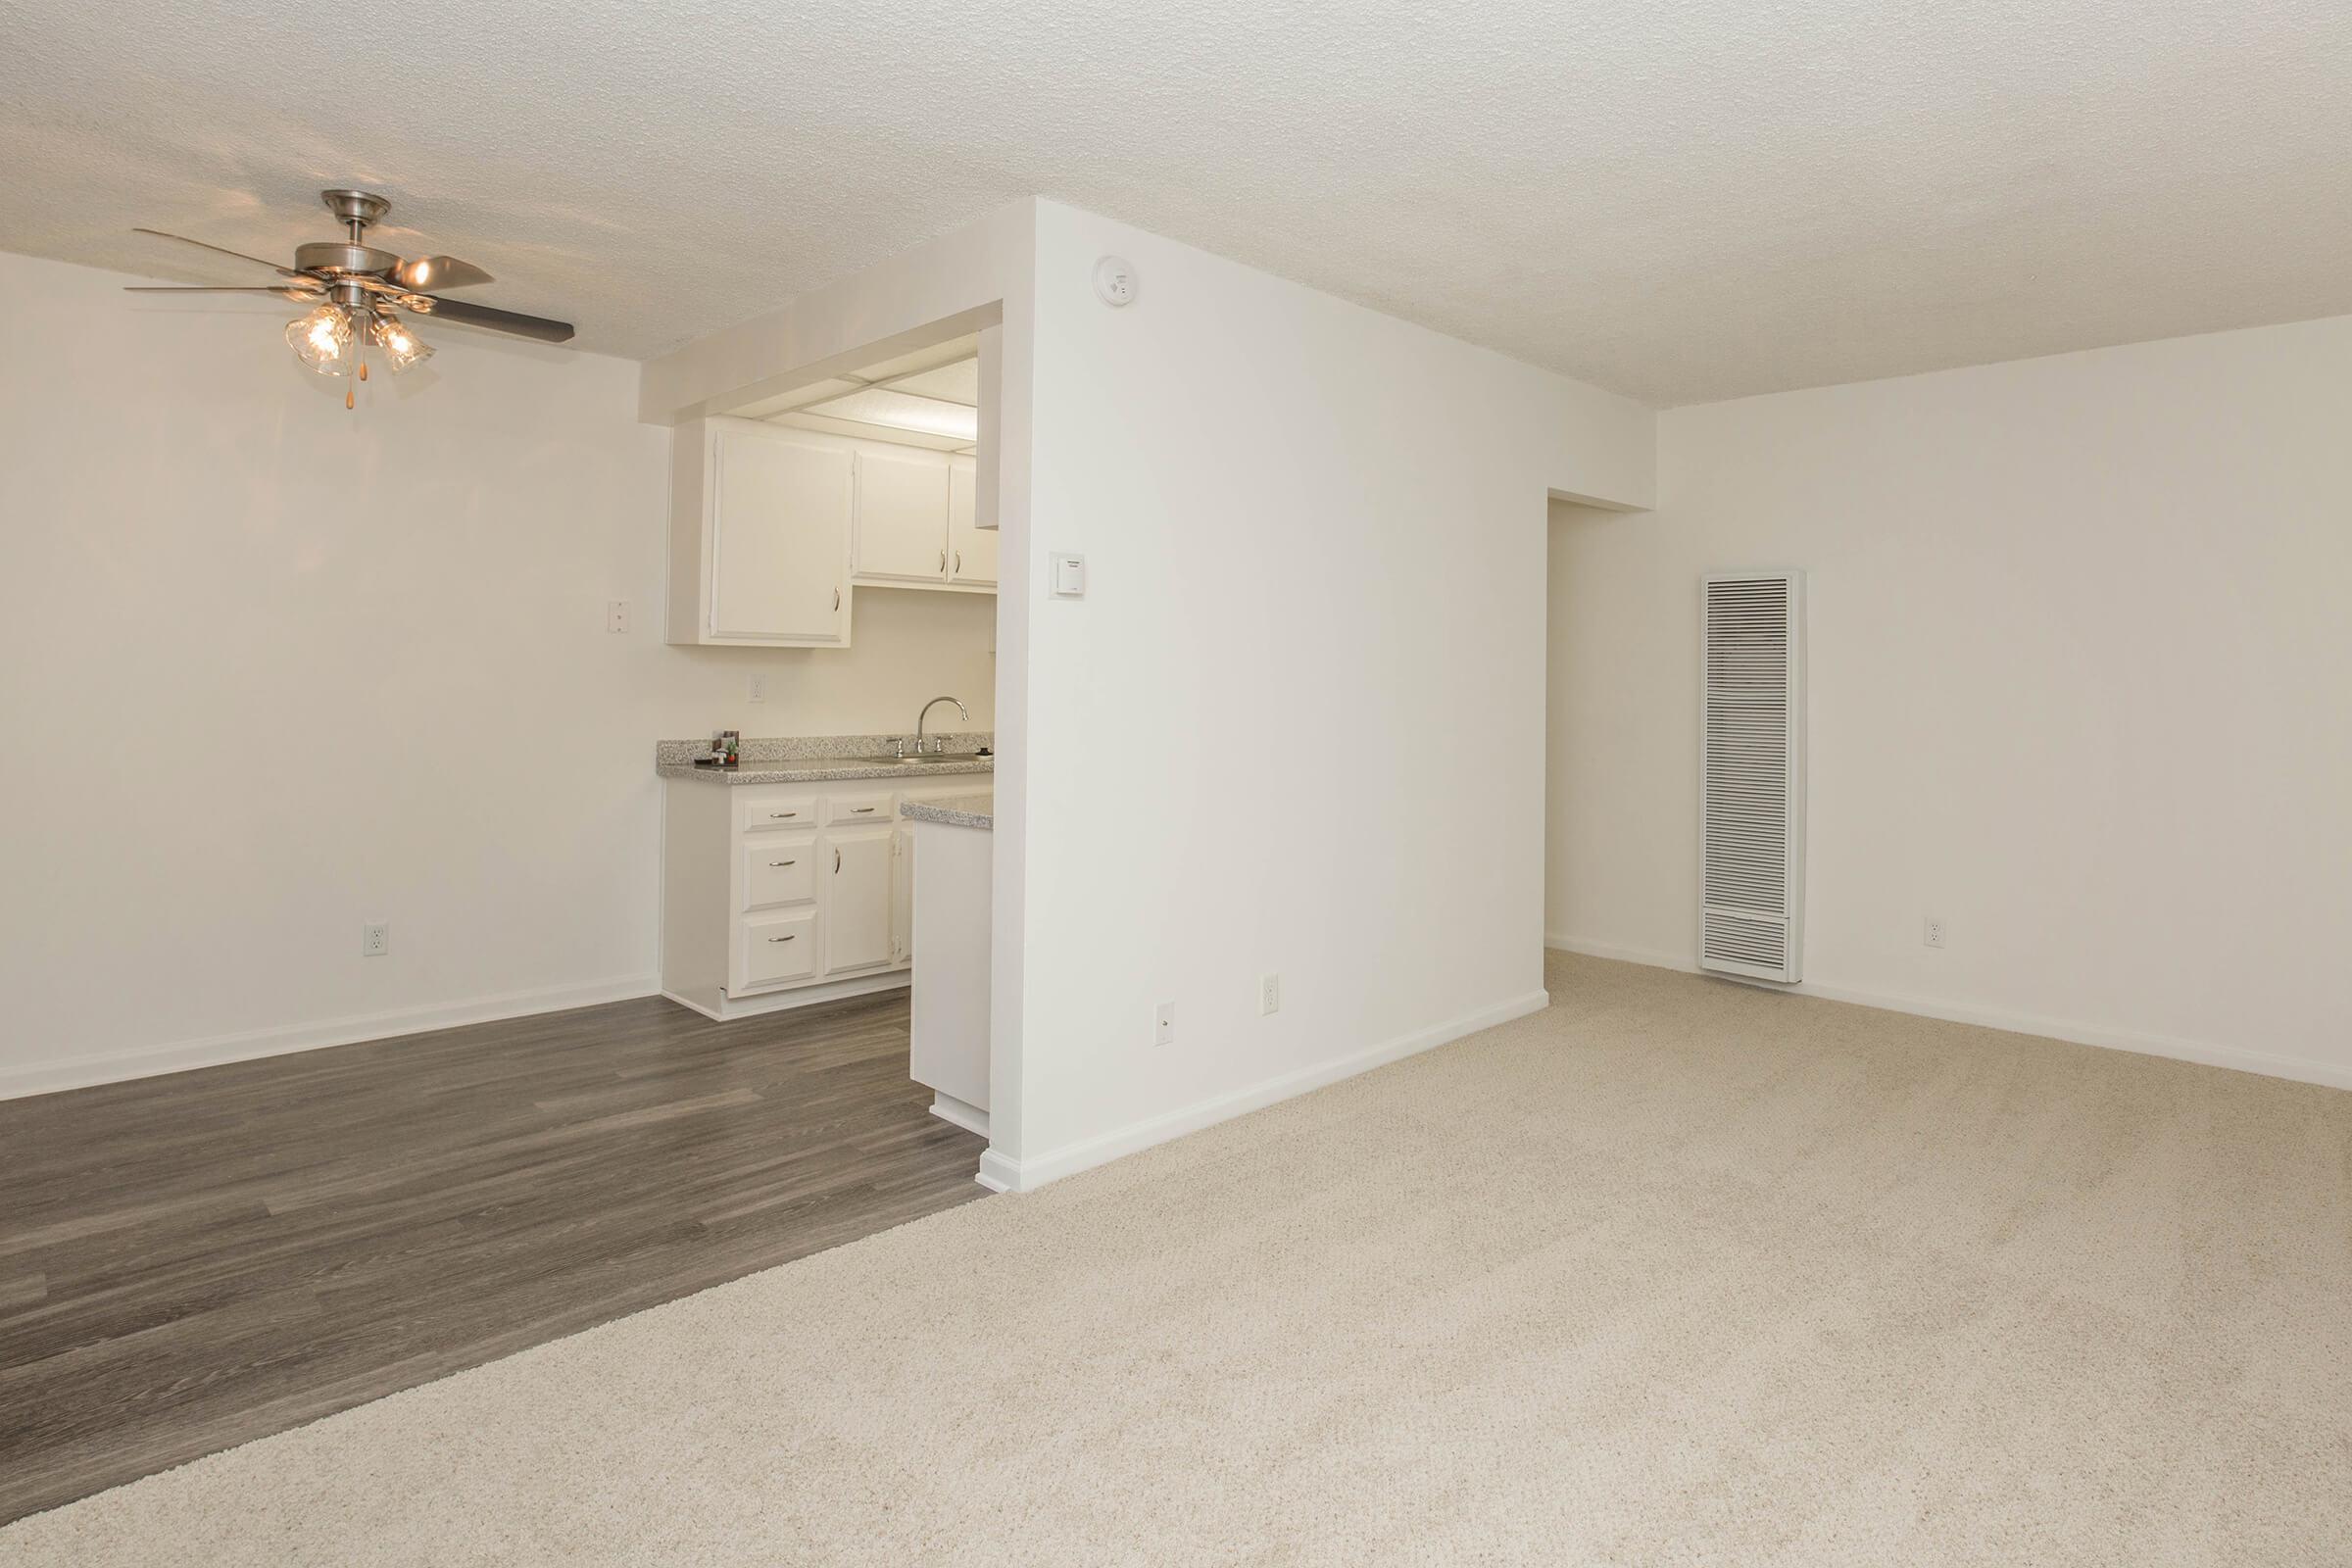 casa madrid apartment homes availability floor plans pricing rh casamadridapartmenthomes com